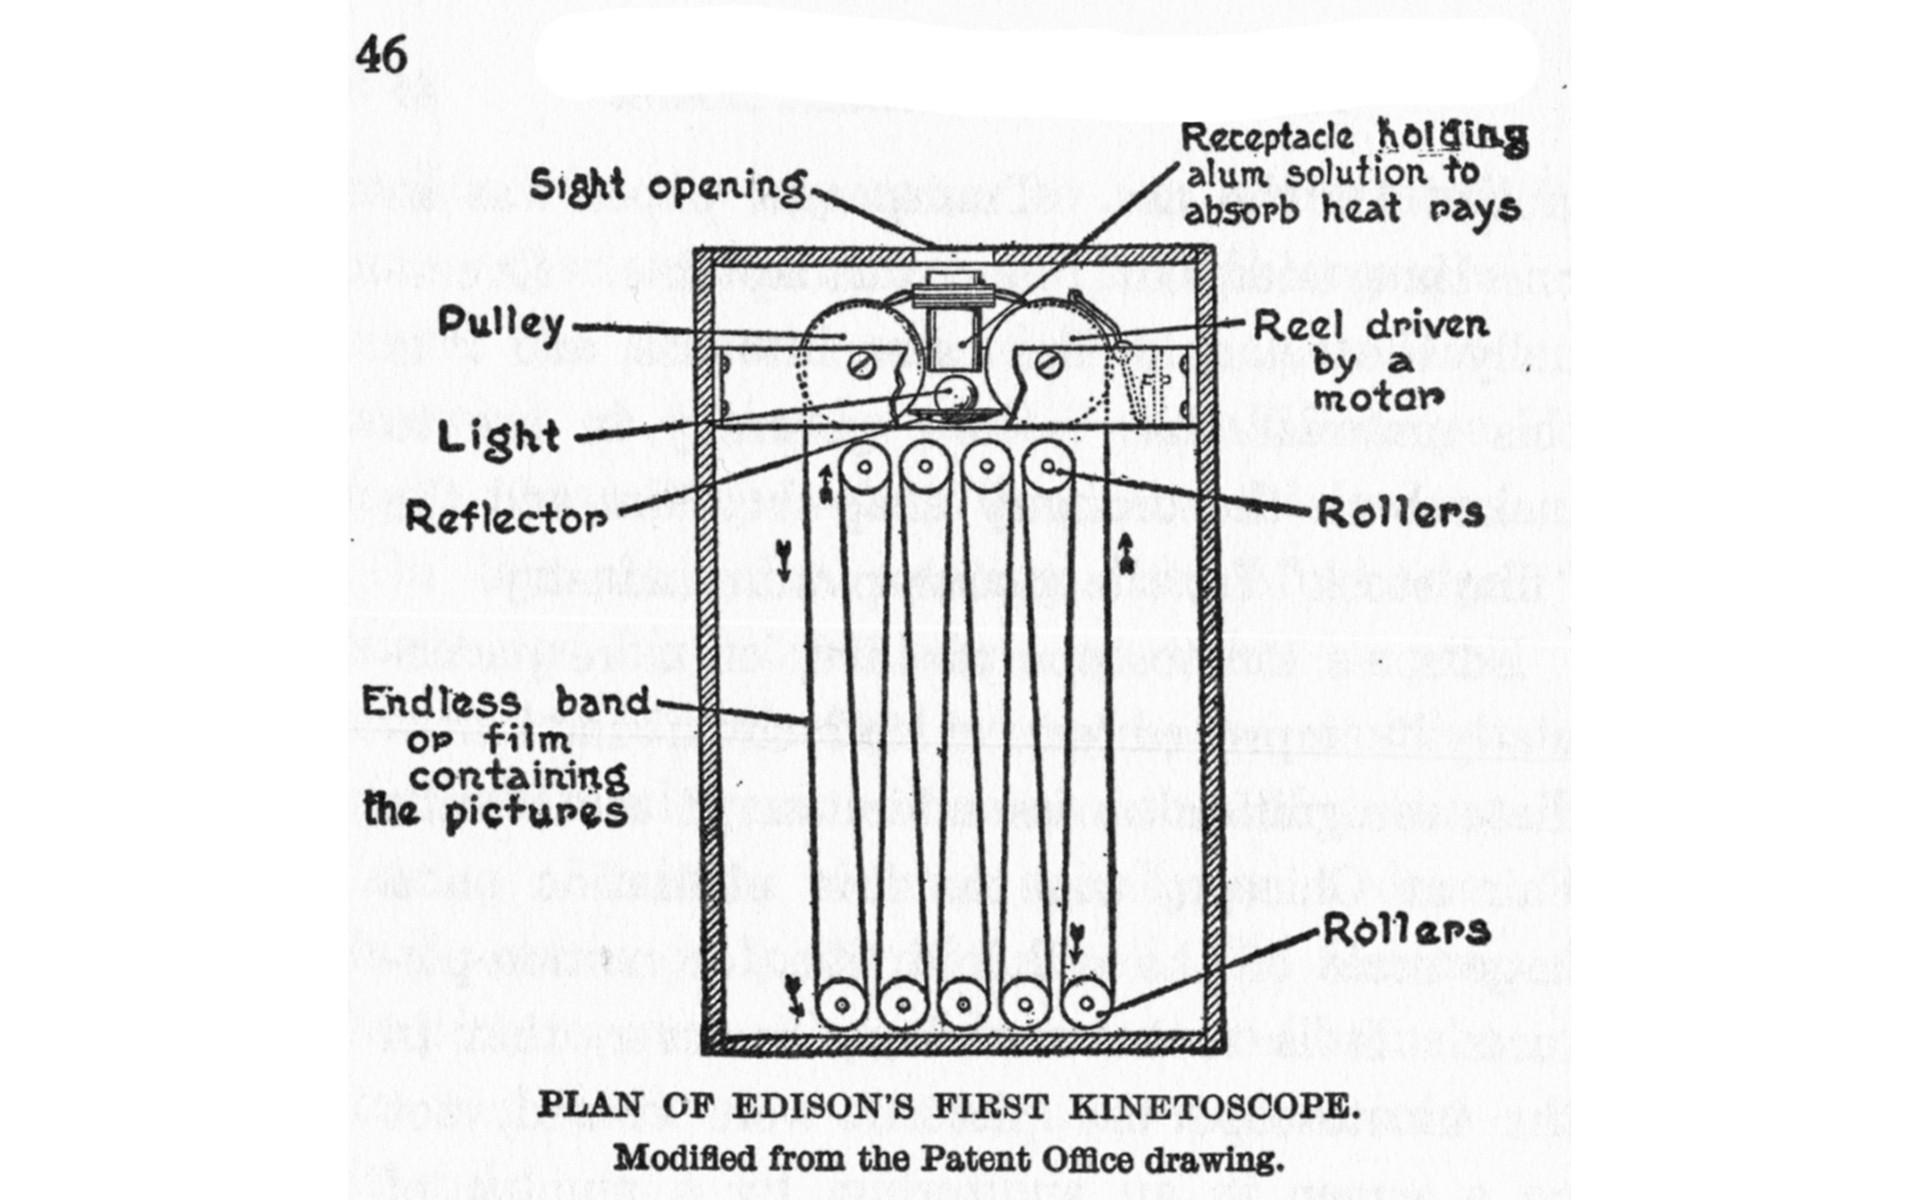 Design for kinetoscope